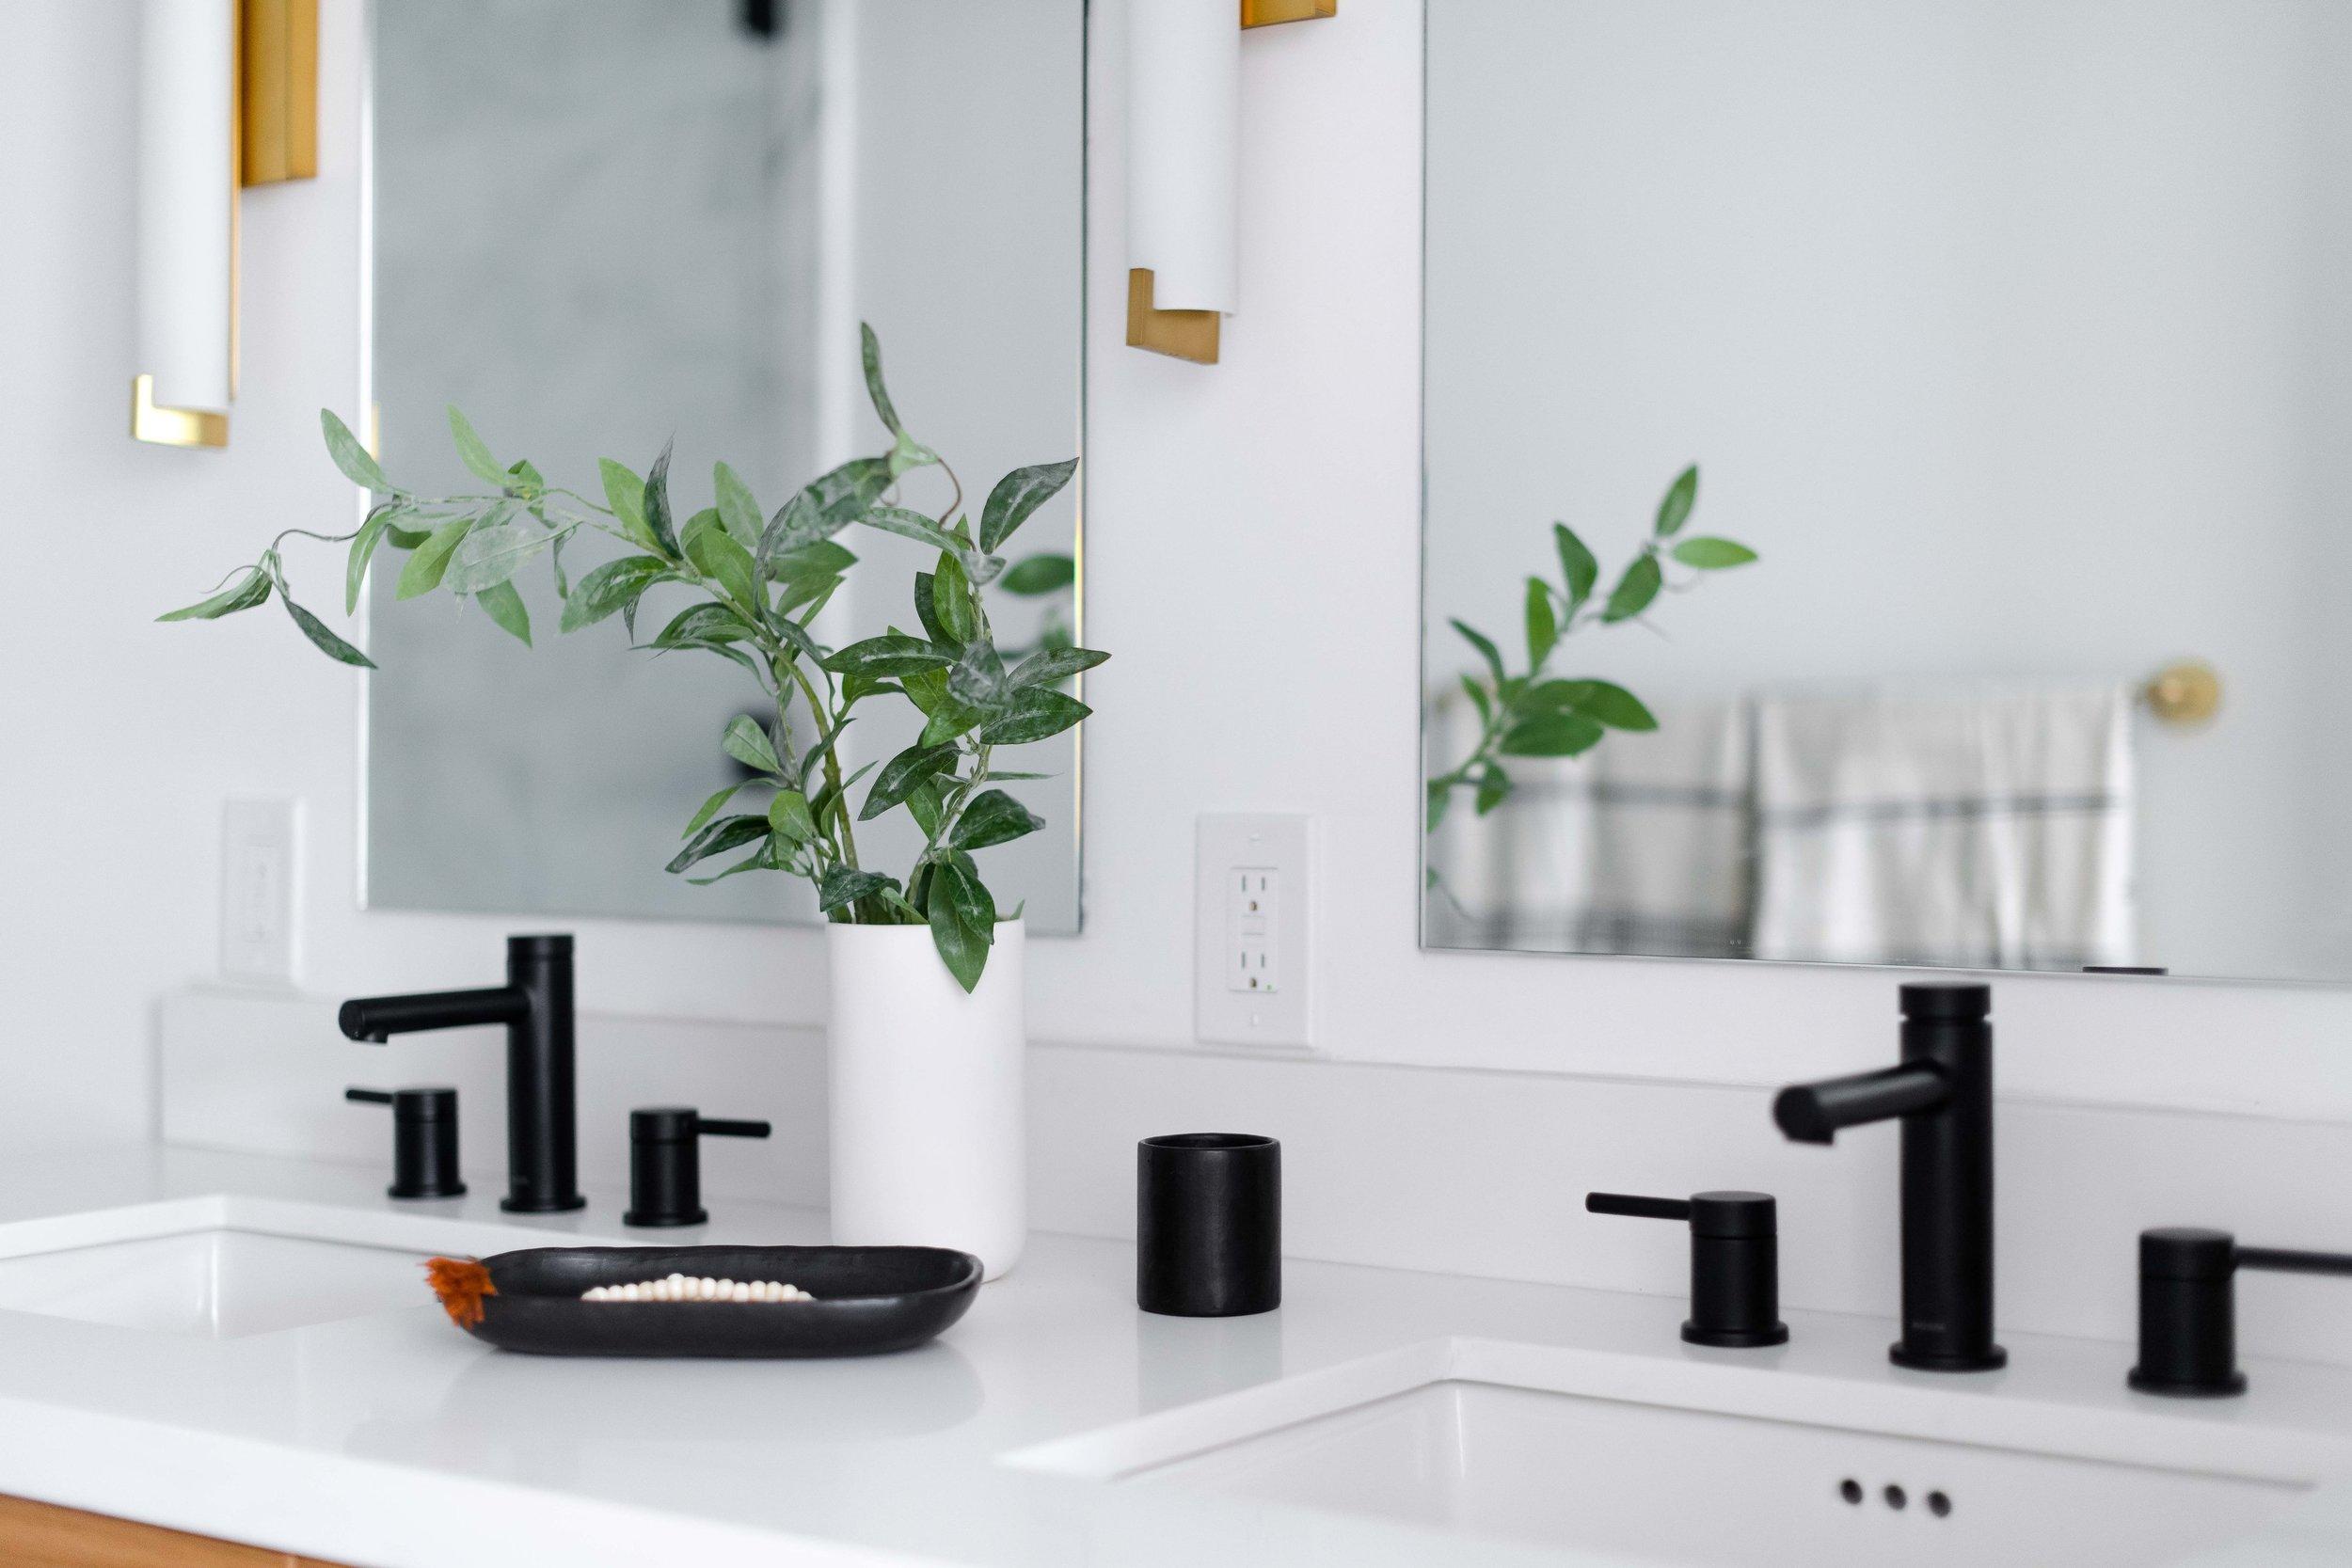 black bathroom faucets - the habitat collective interior design - #projectpeachy